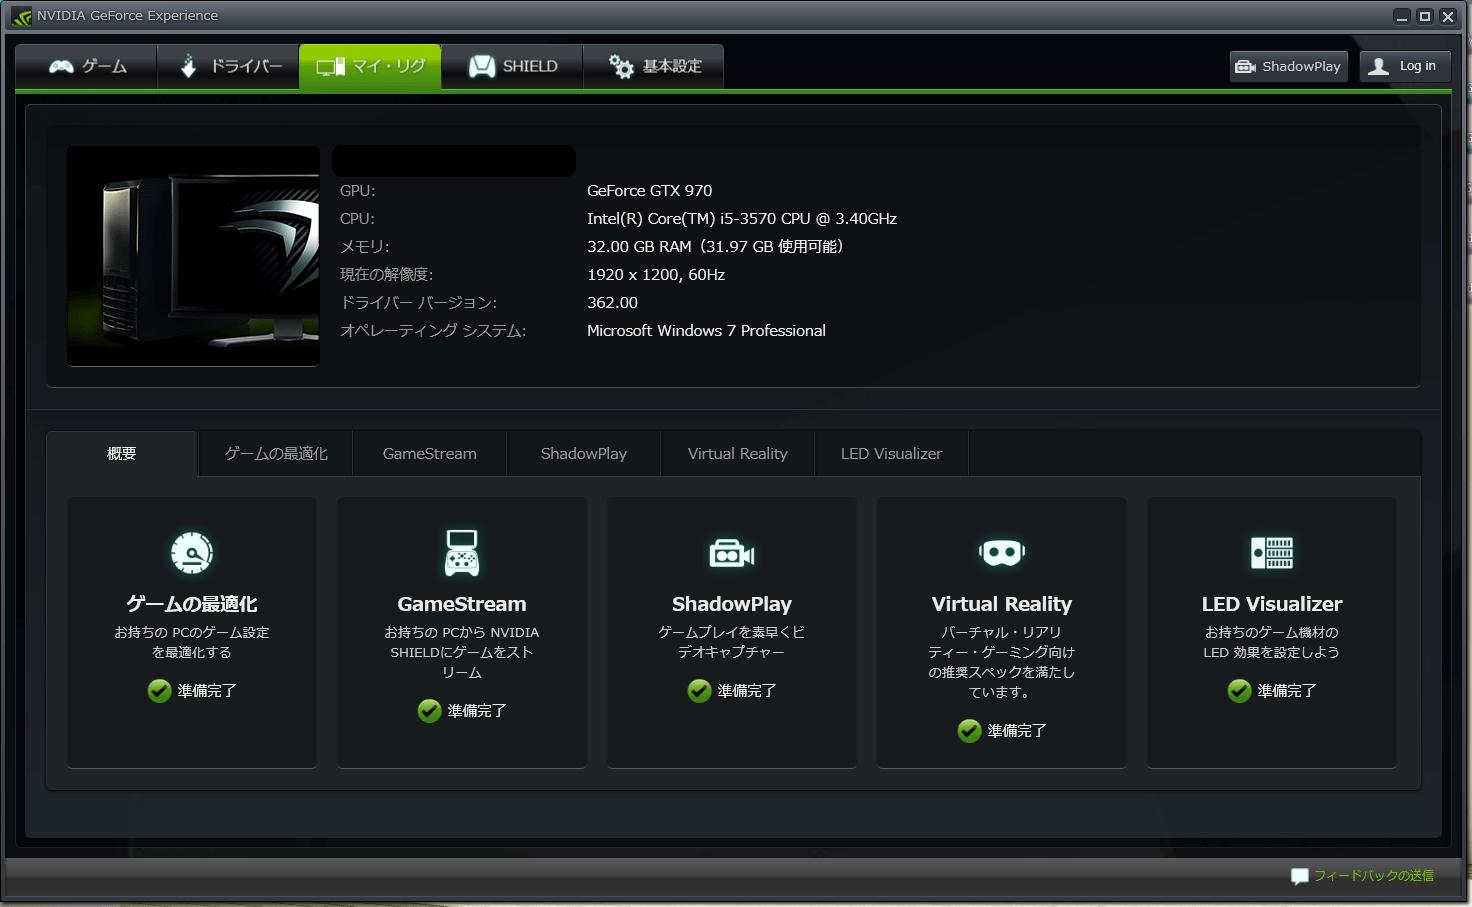 NVIDIA GeForce Experience 2.10.2.40